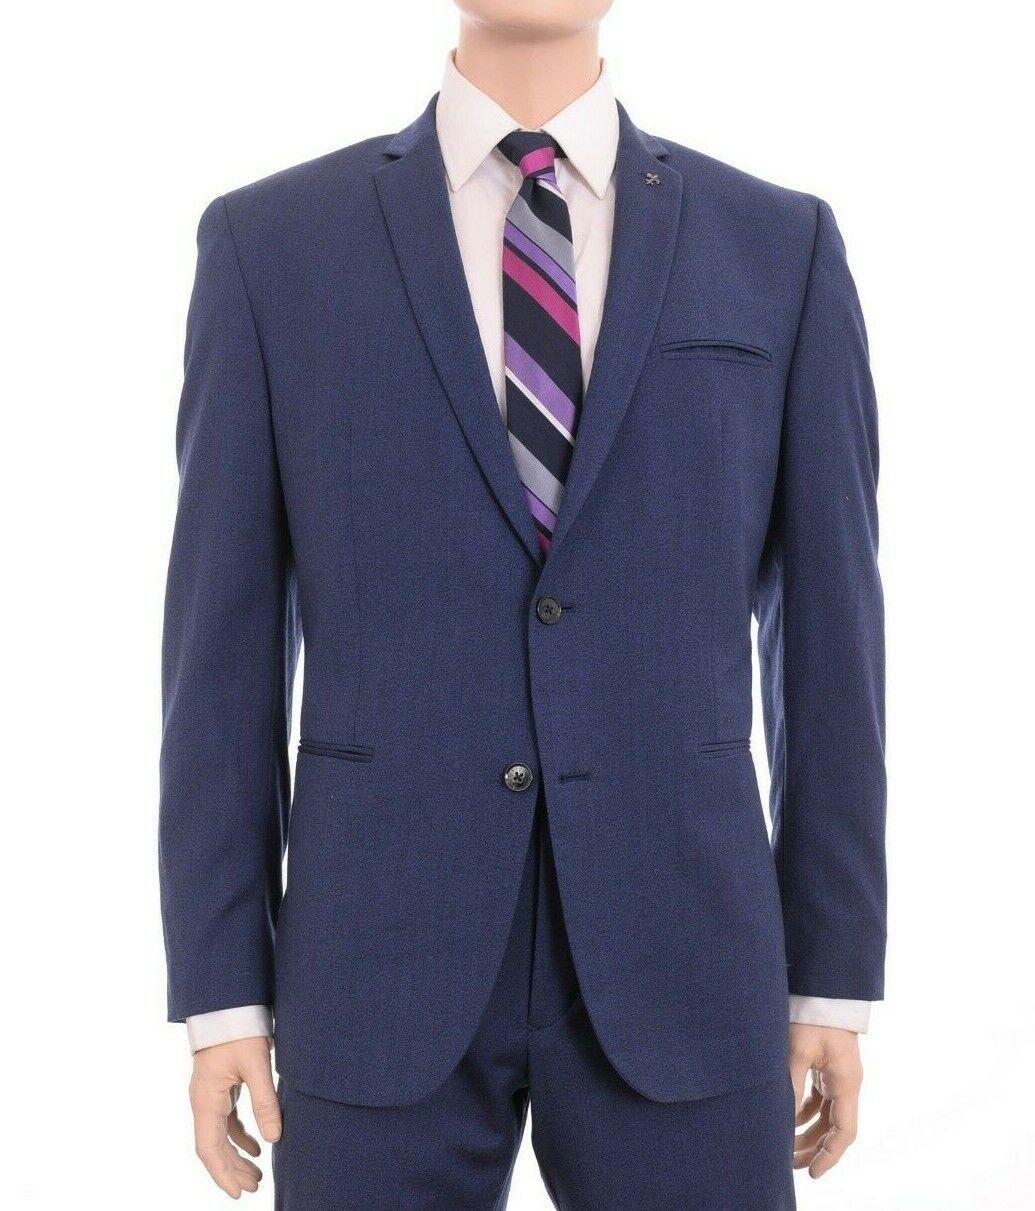 Bar III Slim Fit Cobalt bluee Textured Two Button Wool Blend Sportcoat Blazer 38S